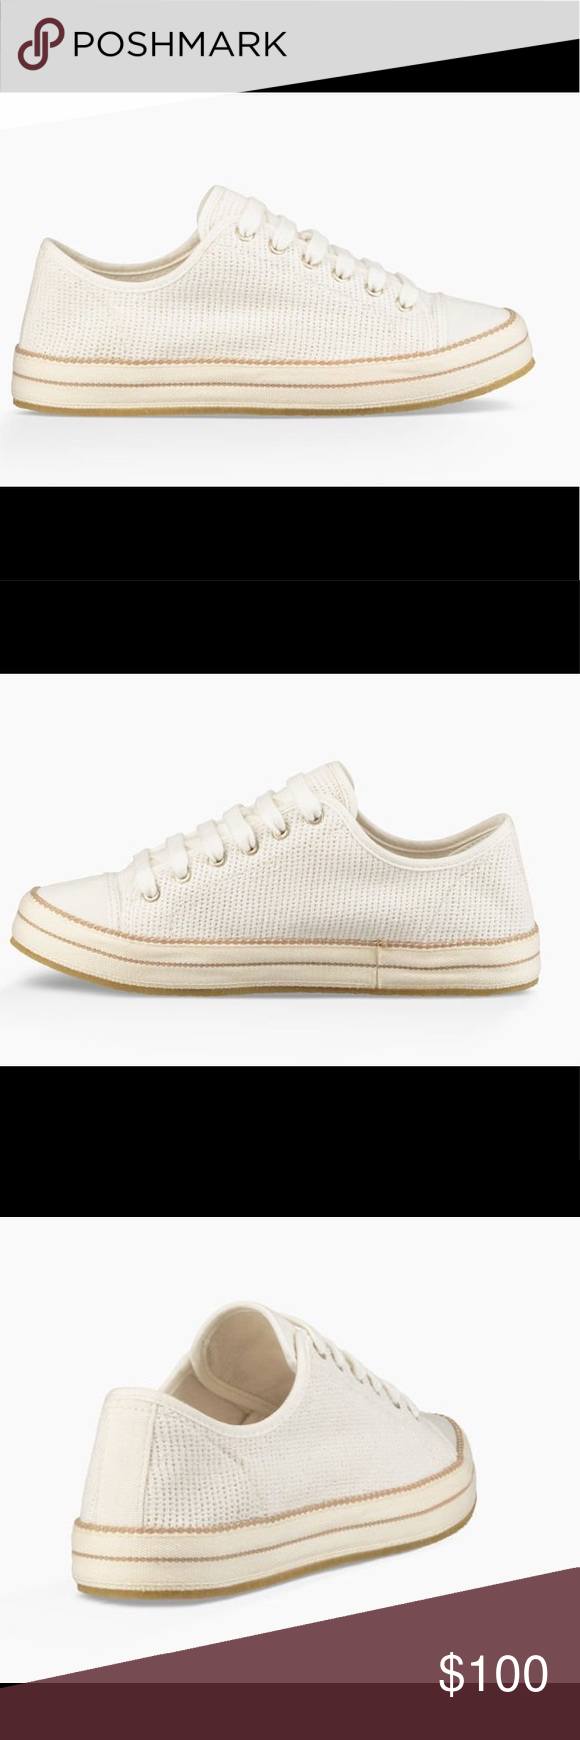 03865143bee UGG♥️NEW♥️Claudi Sneaker natural UGG NEW Claudi sneaker natural ...